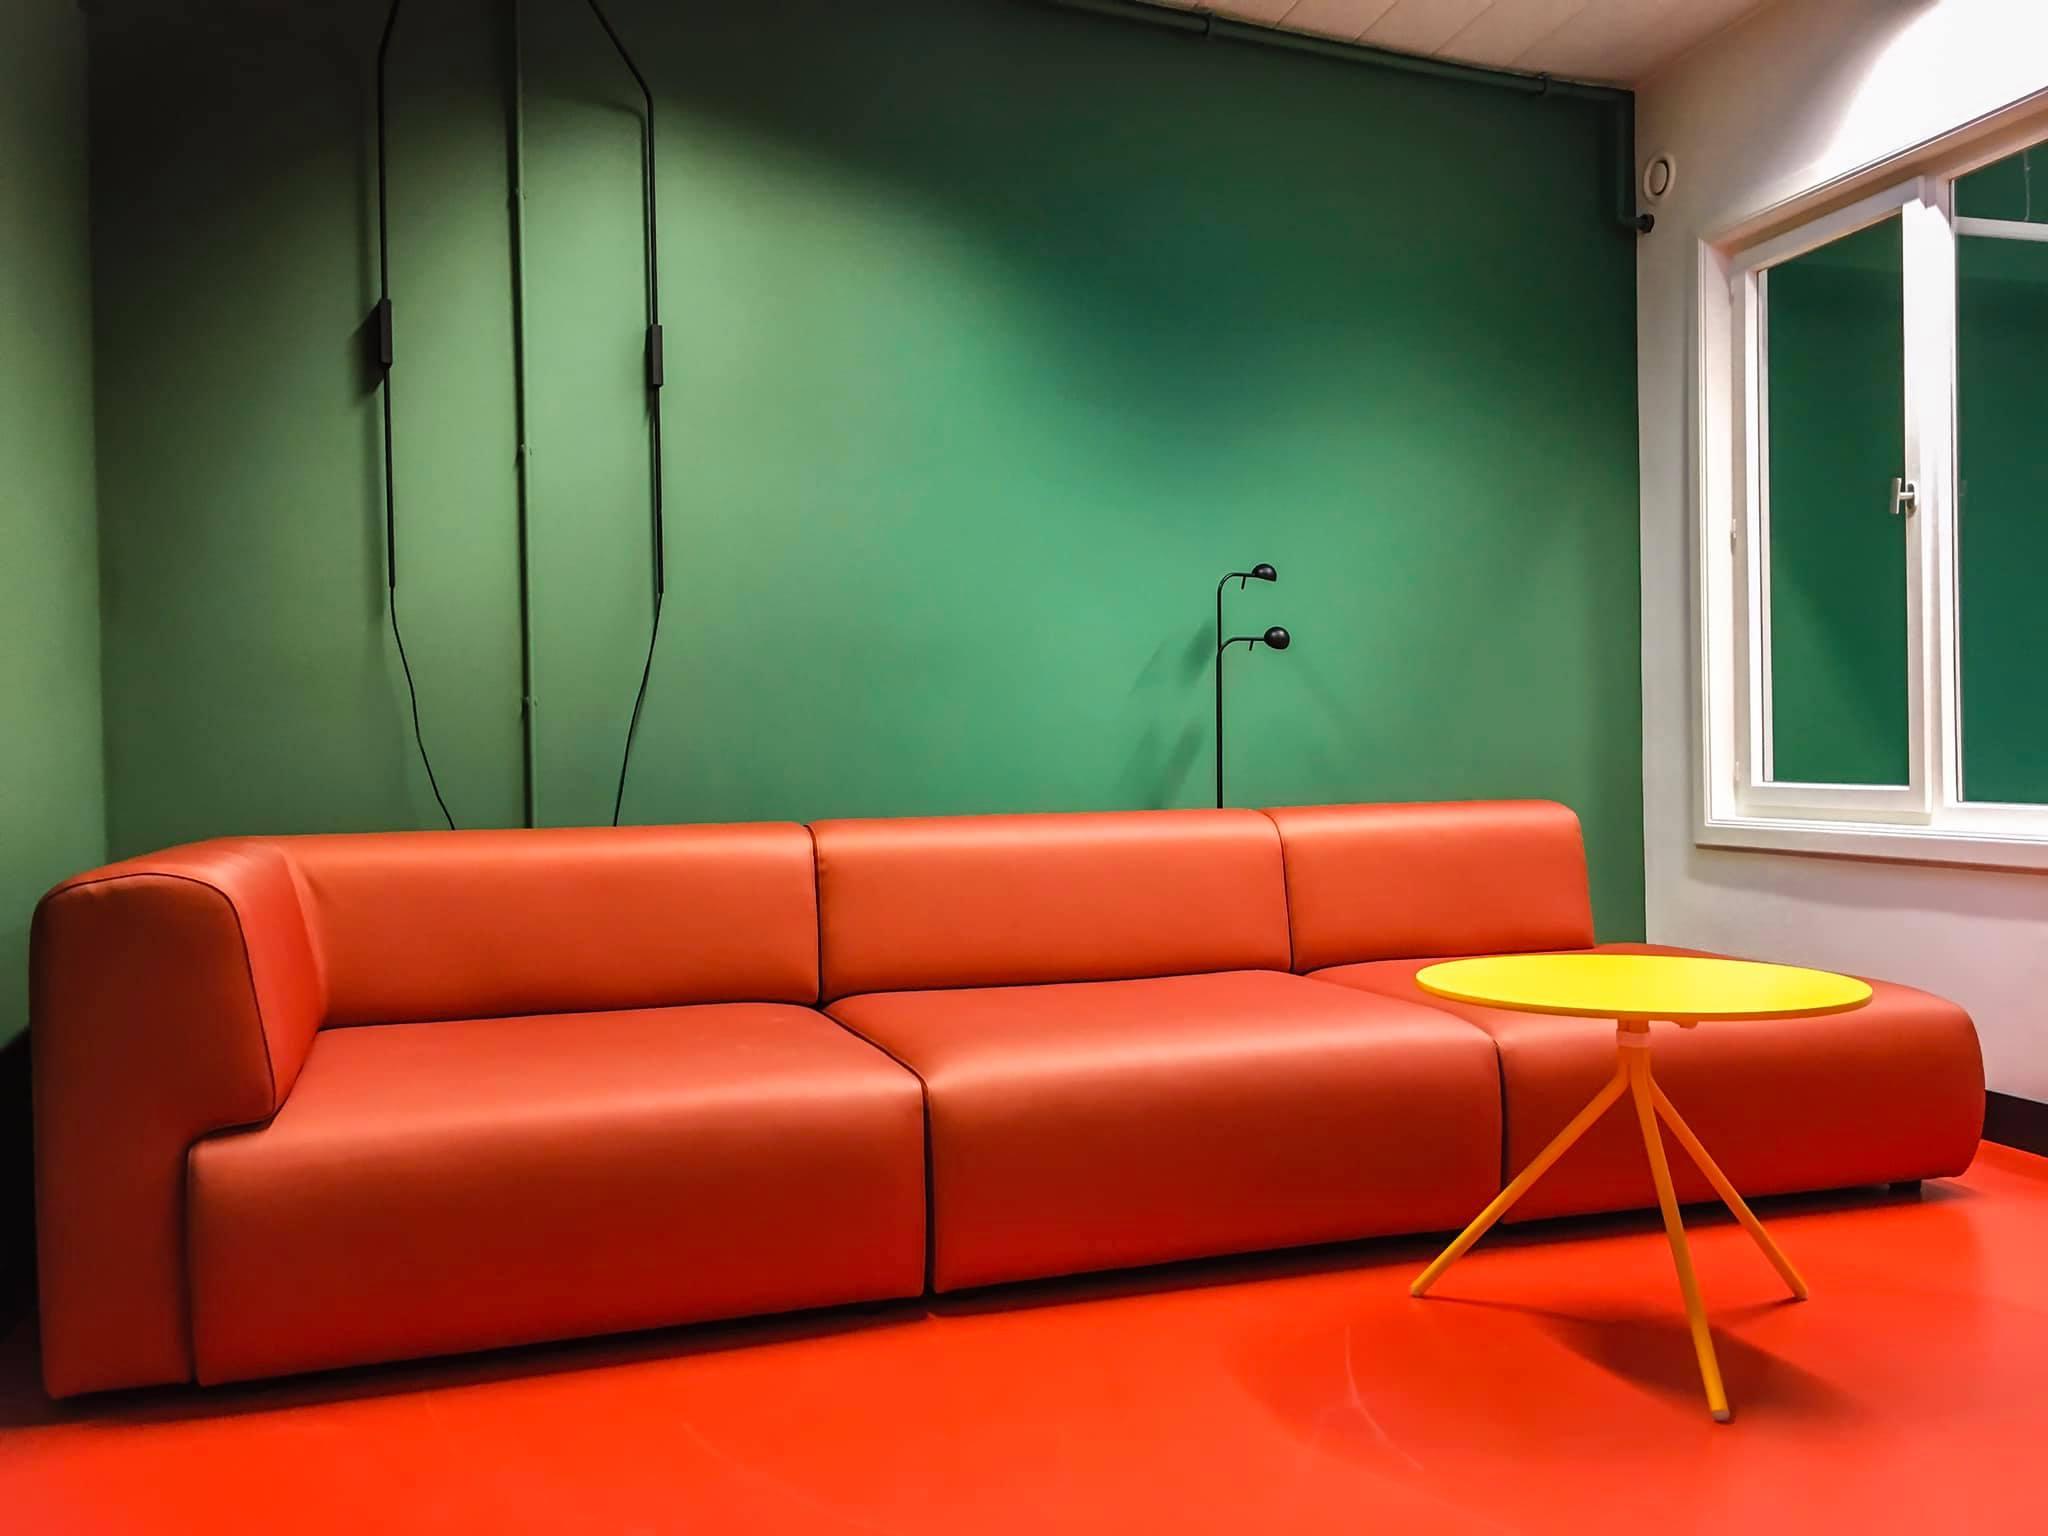 Foodies Arena Ghent Belgium, coworking office